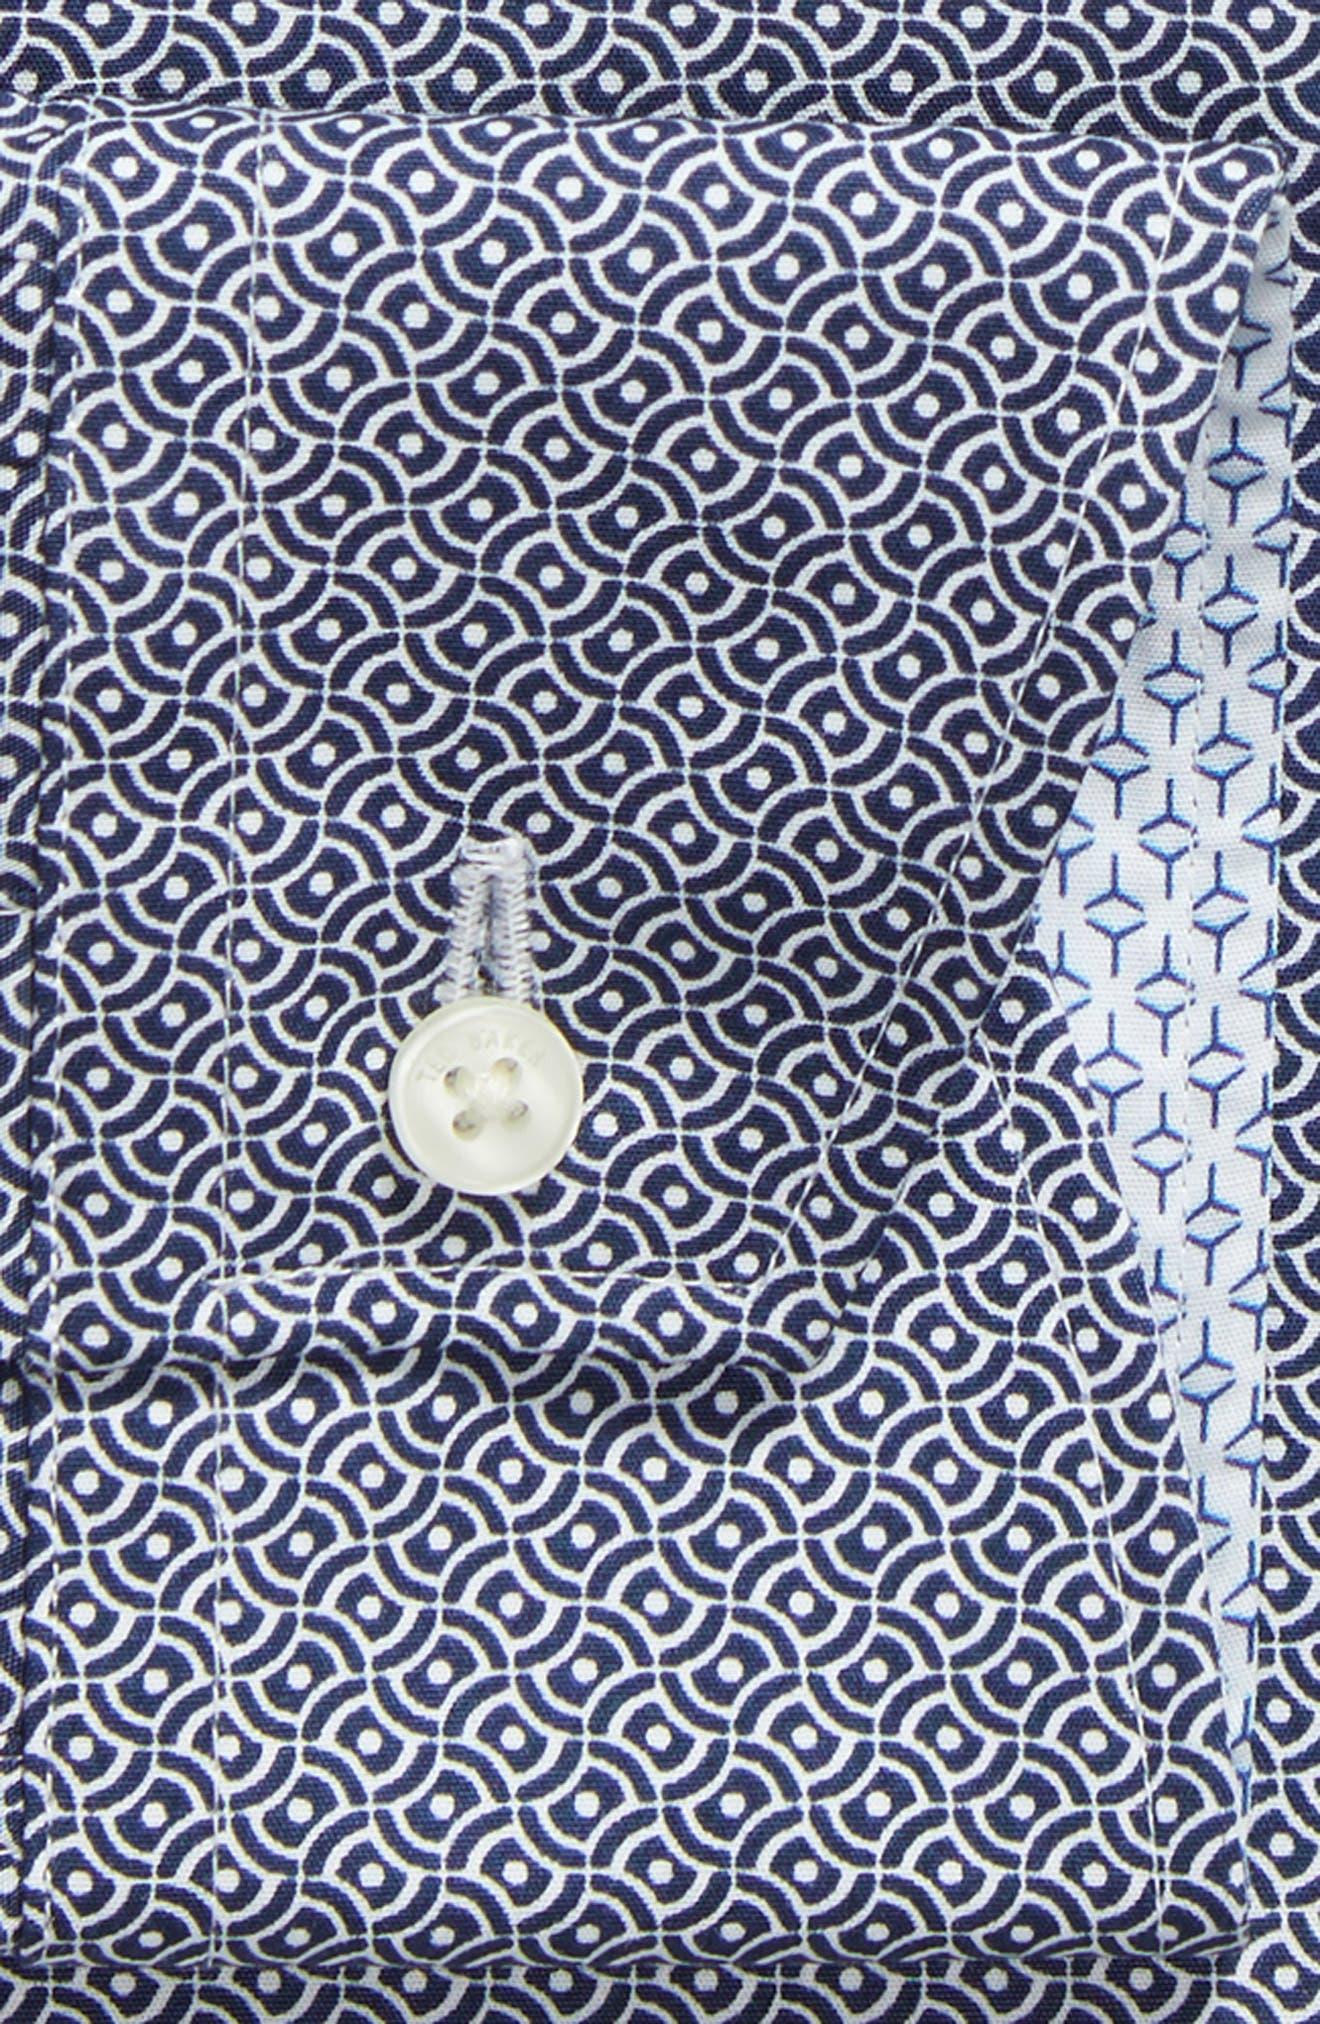 Footz Slim Fit Geometric Dress Shirt,                             Alternate thumbnail 6, color,                             NAVY